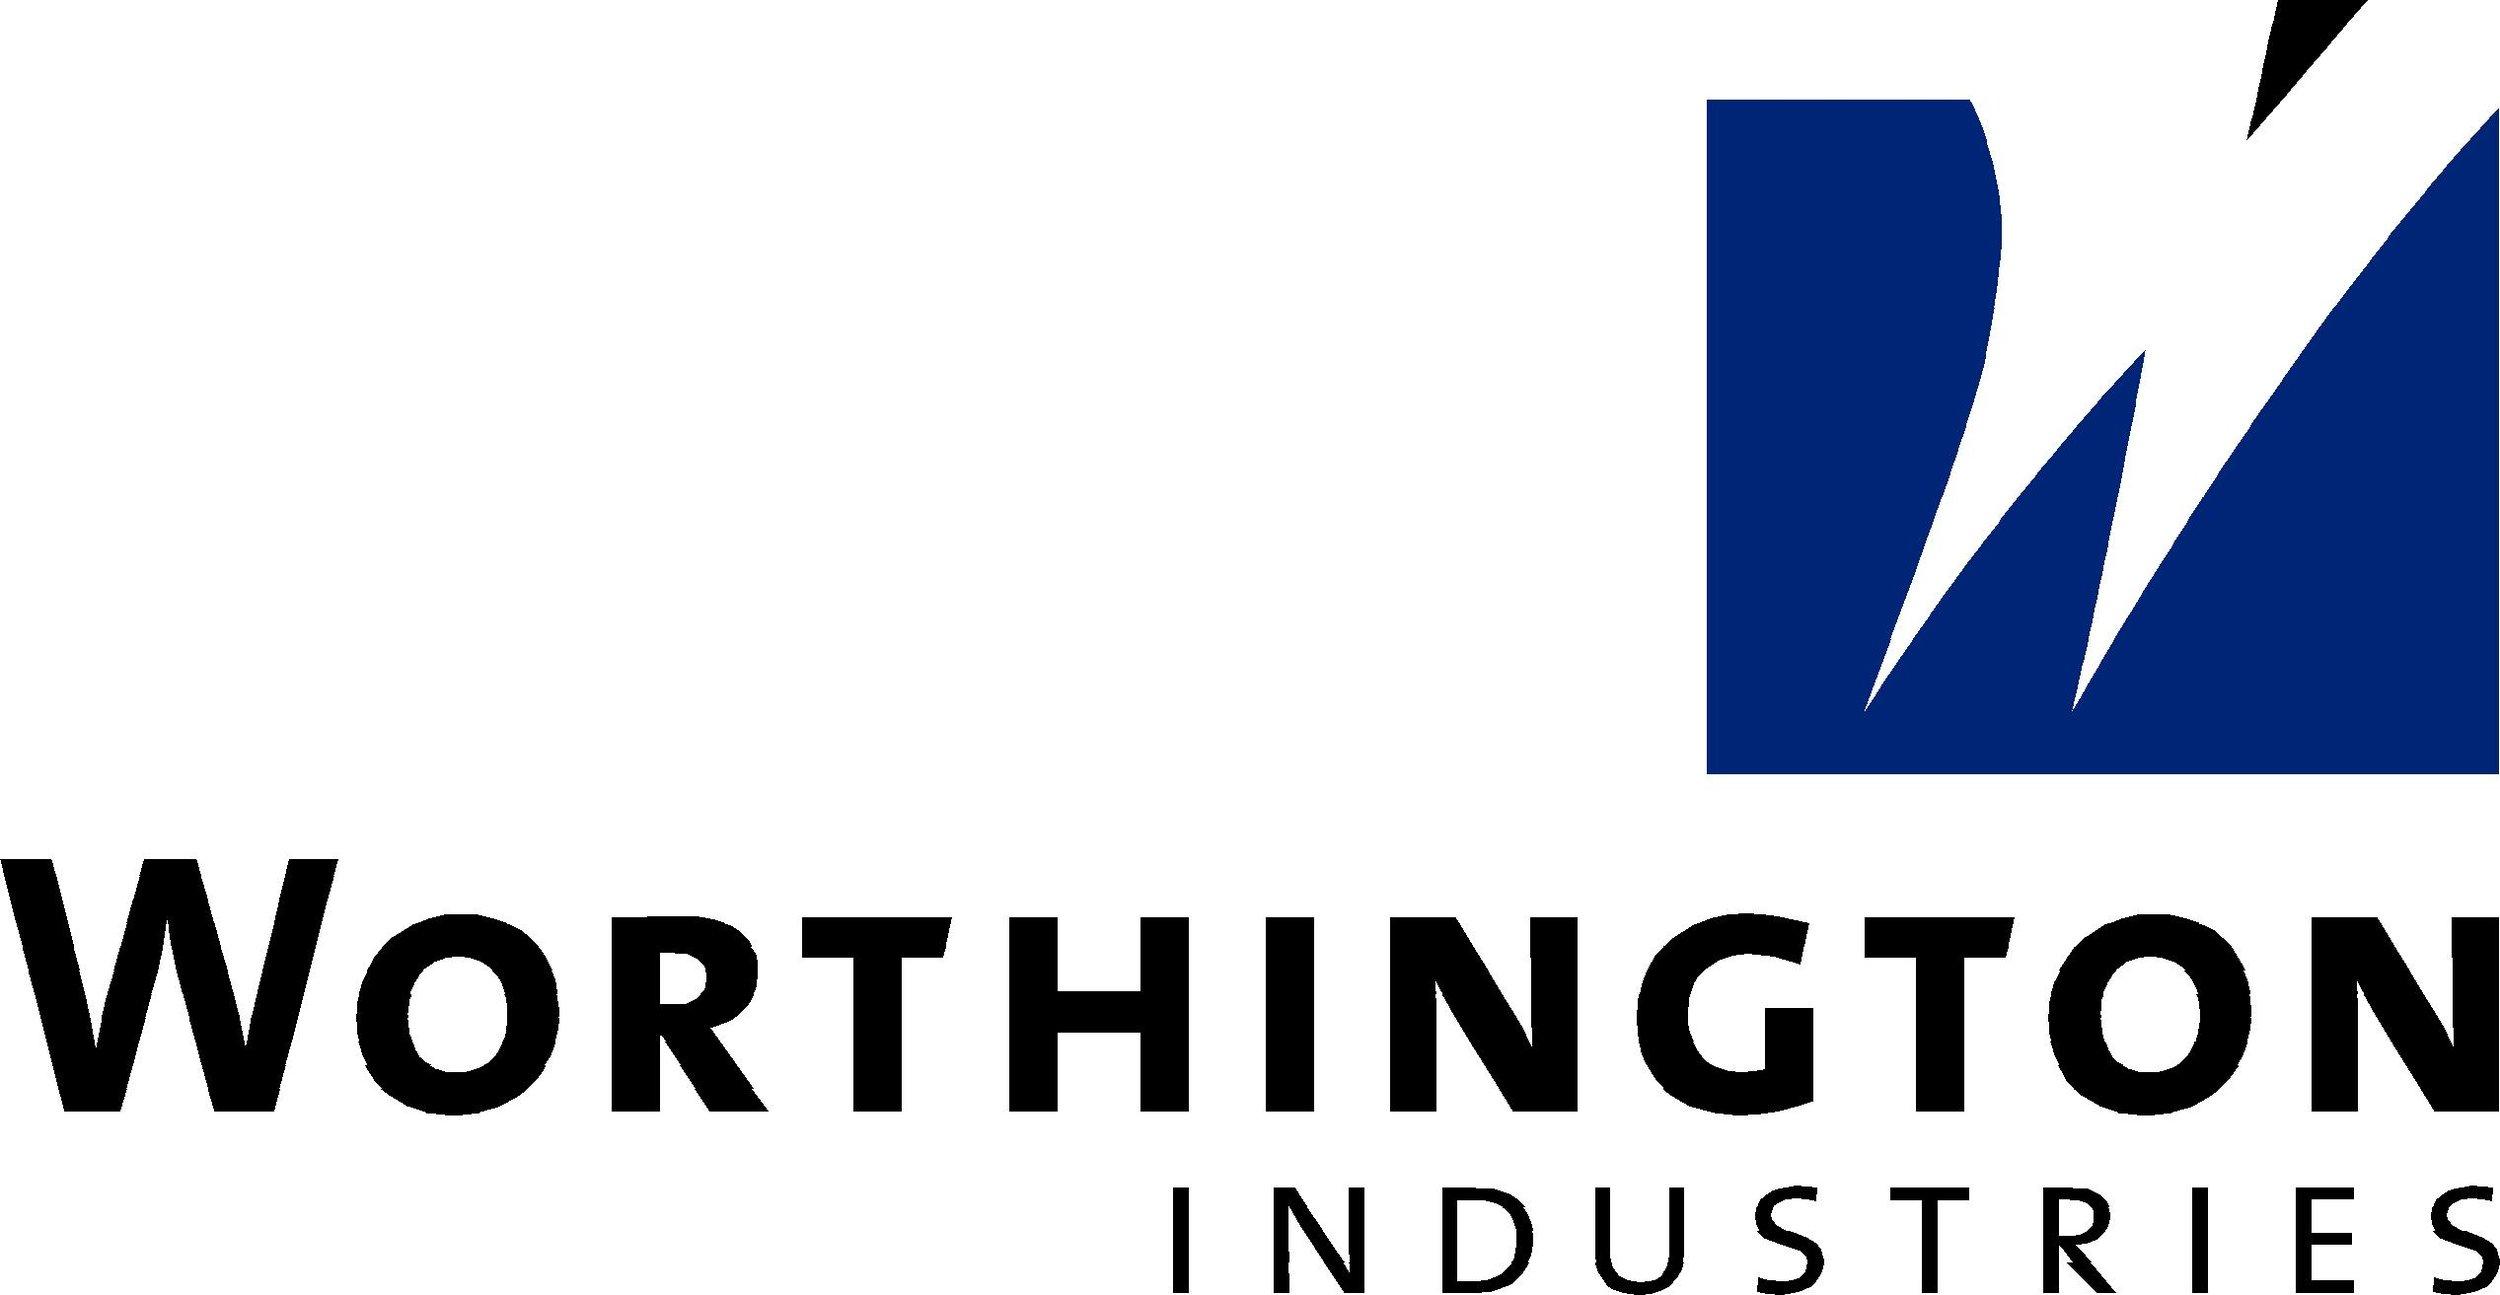 Copy of Worthington Industries